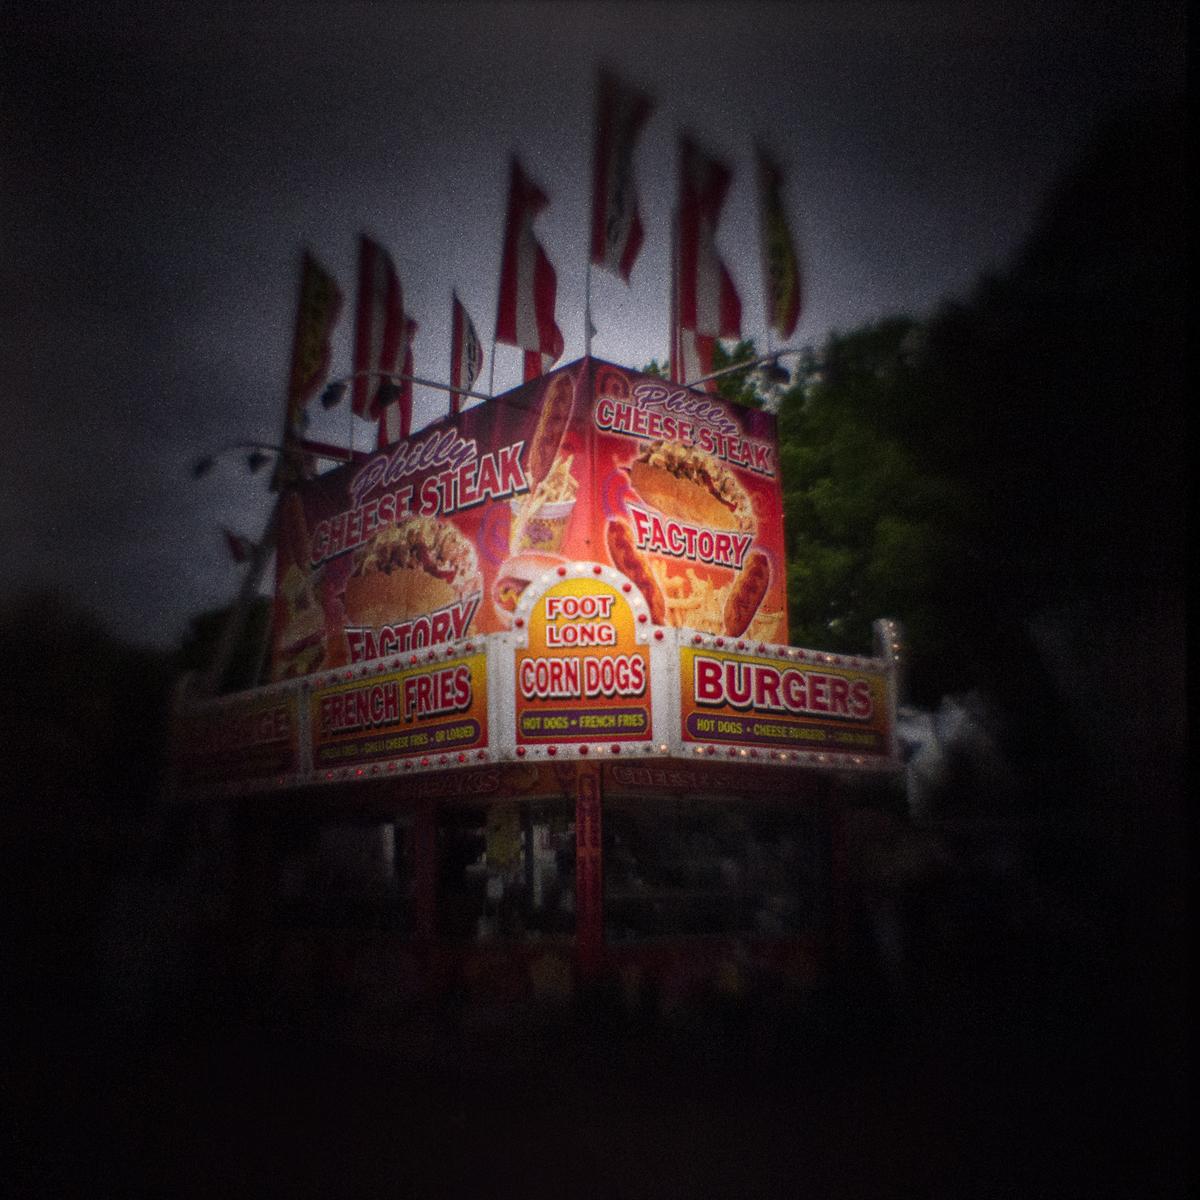 Vivona Carnival, Philly Cheese Steak